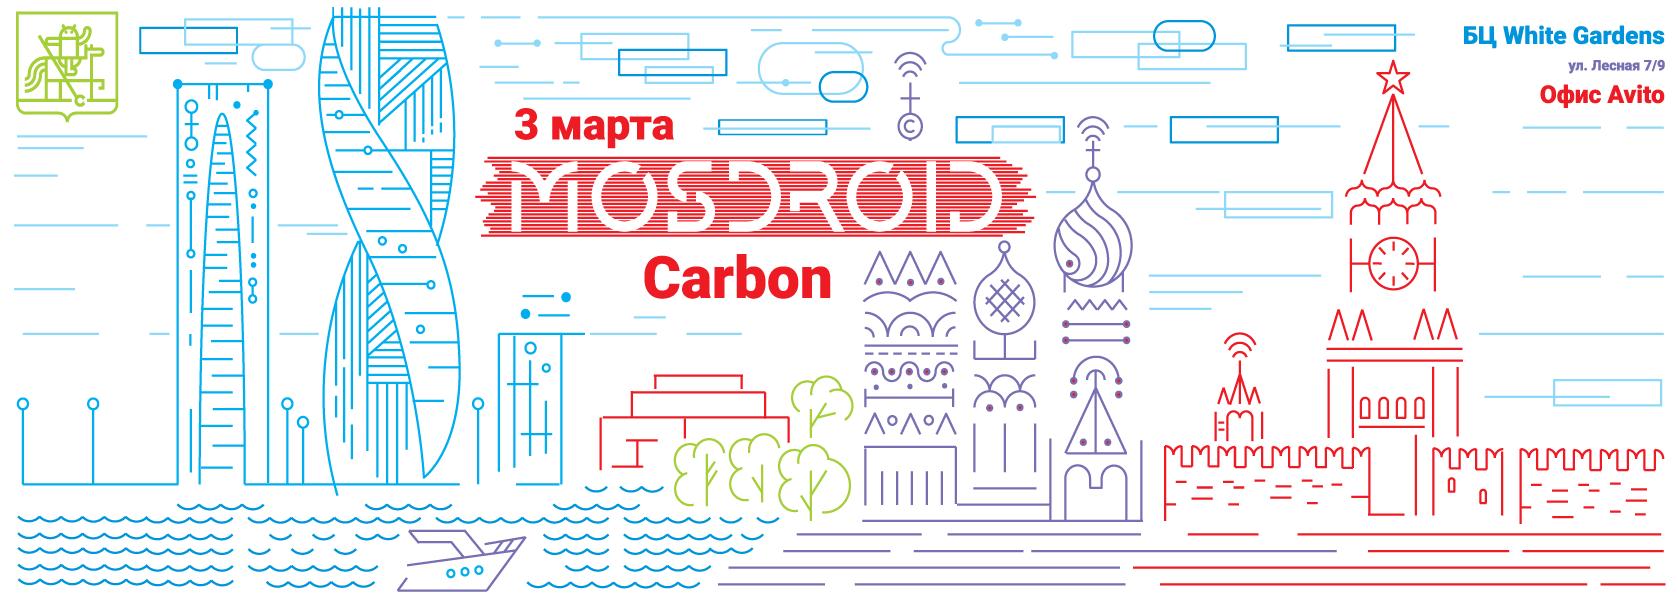 Mosdroid в Avito — анонс